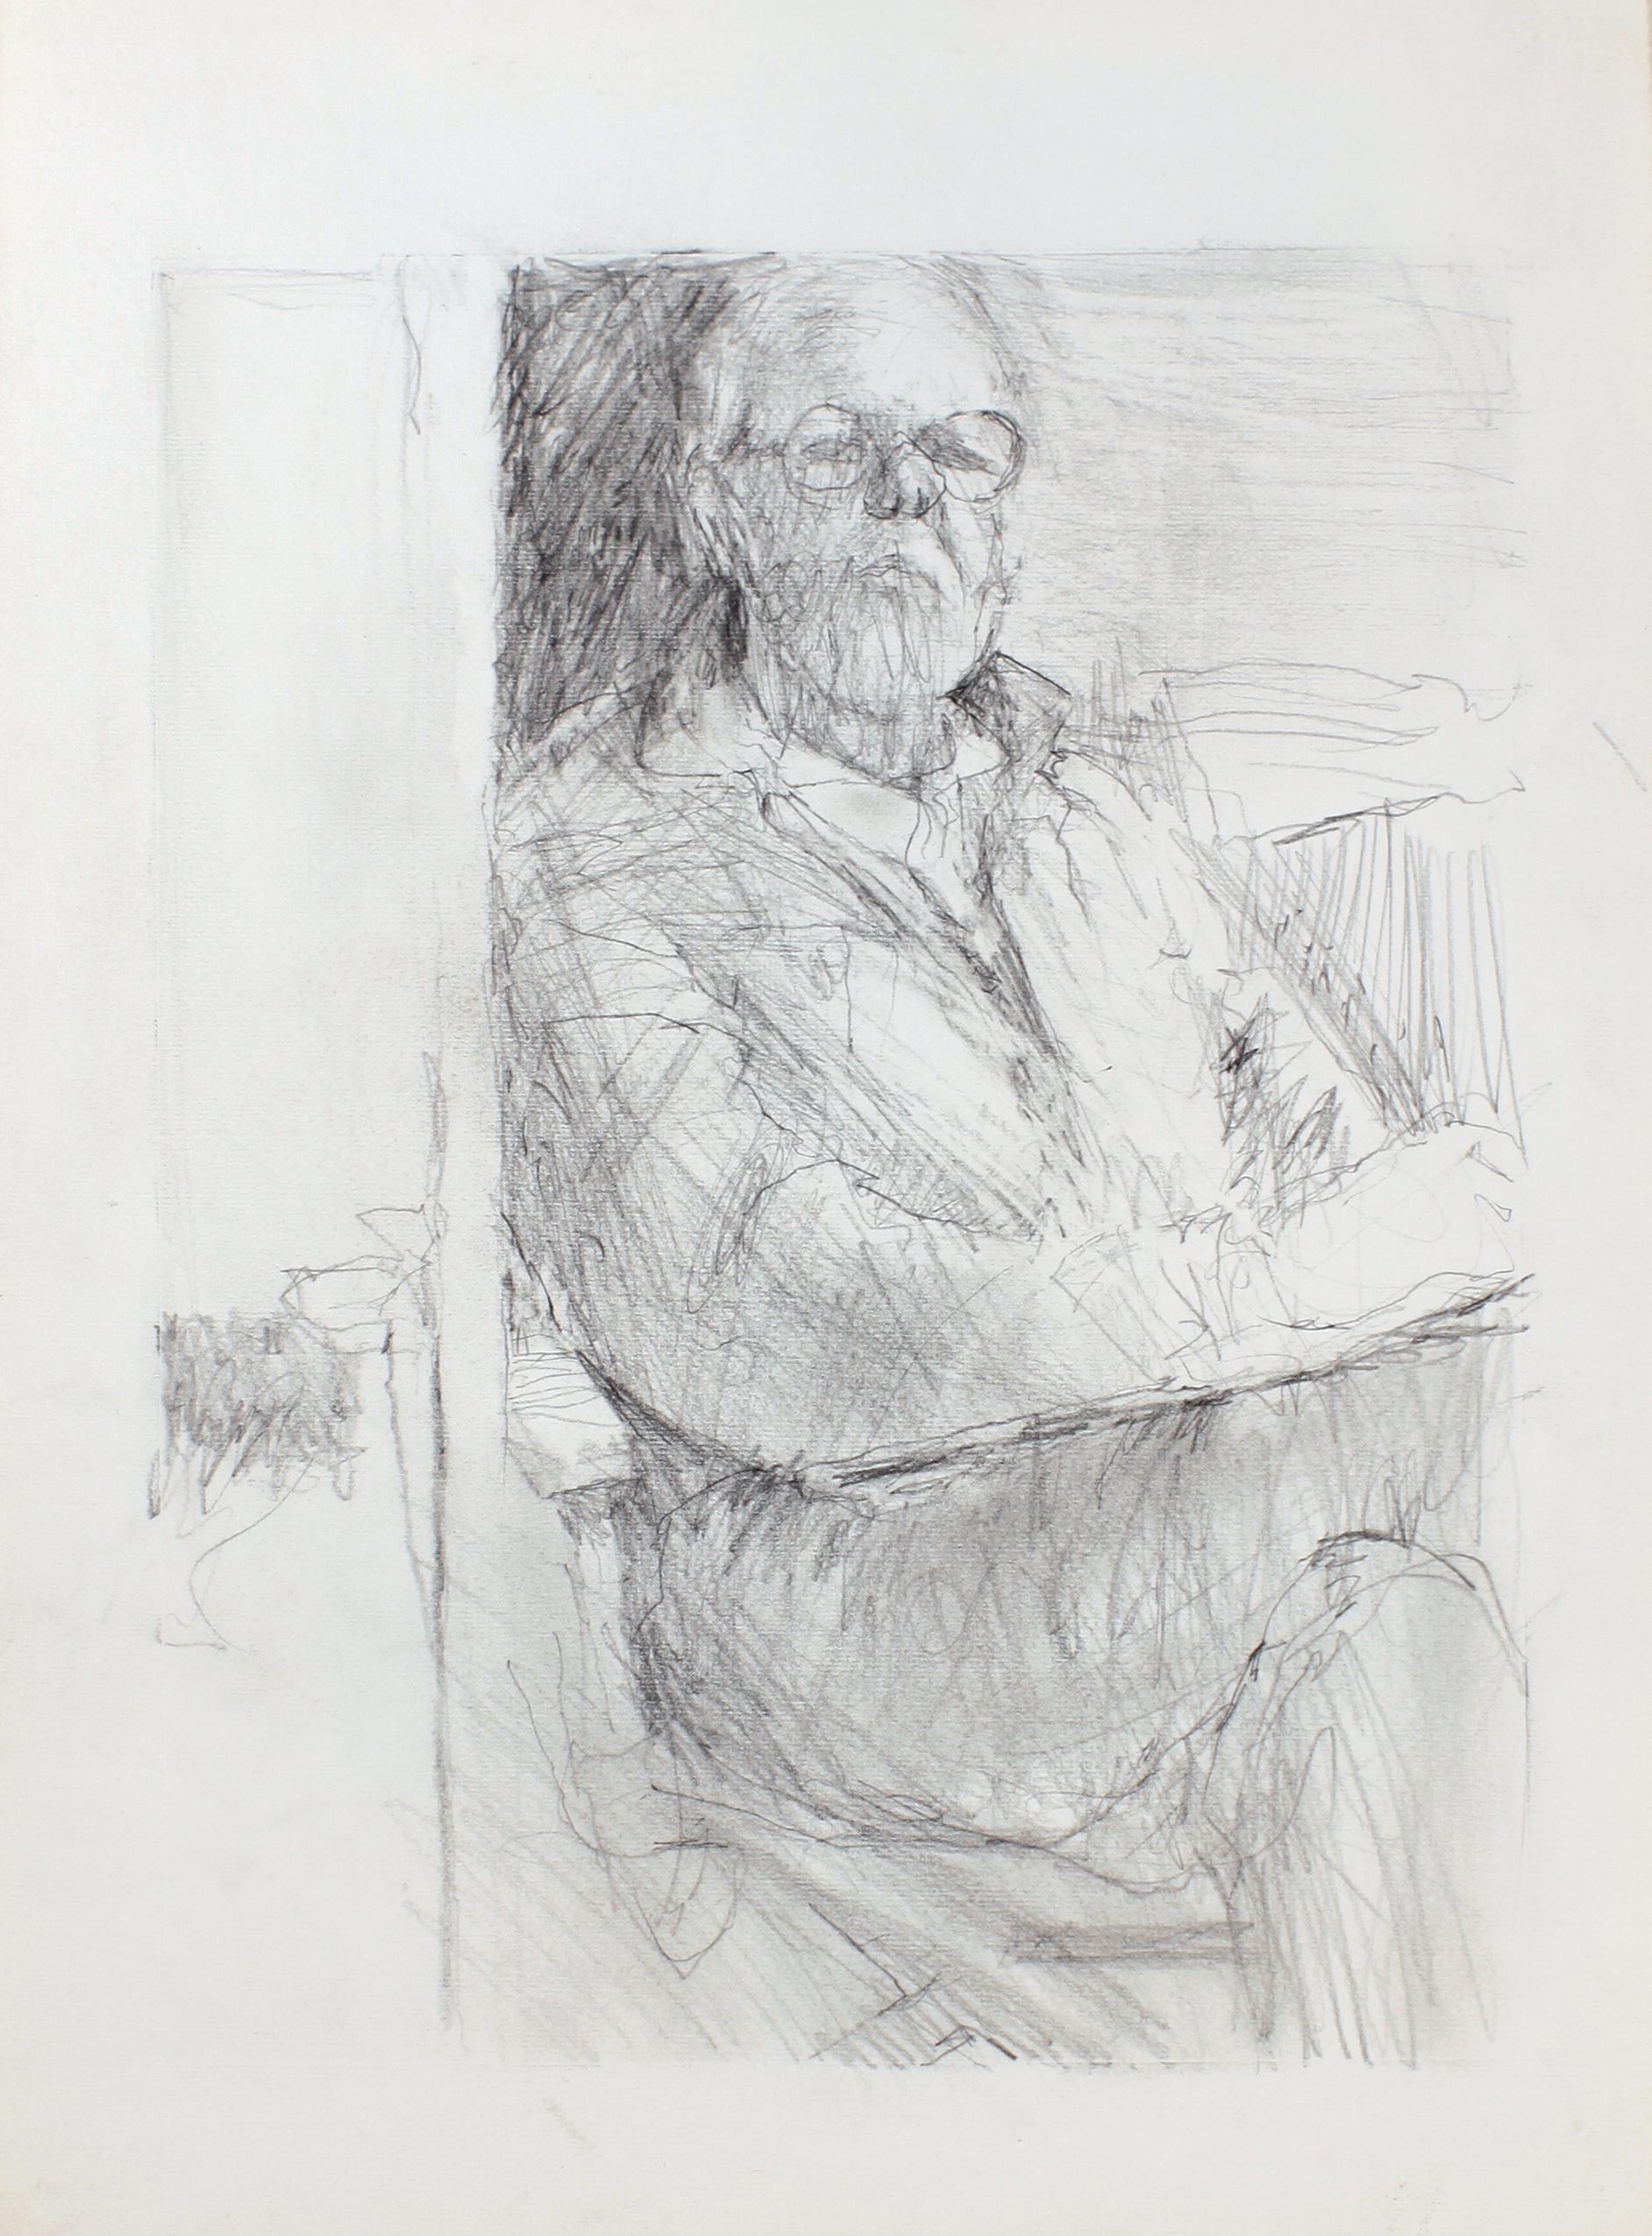 1990s_Self_Portrait_pencil_on_Paper_15x11in_WPF498.jpg